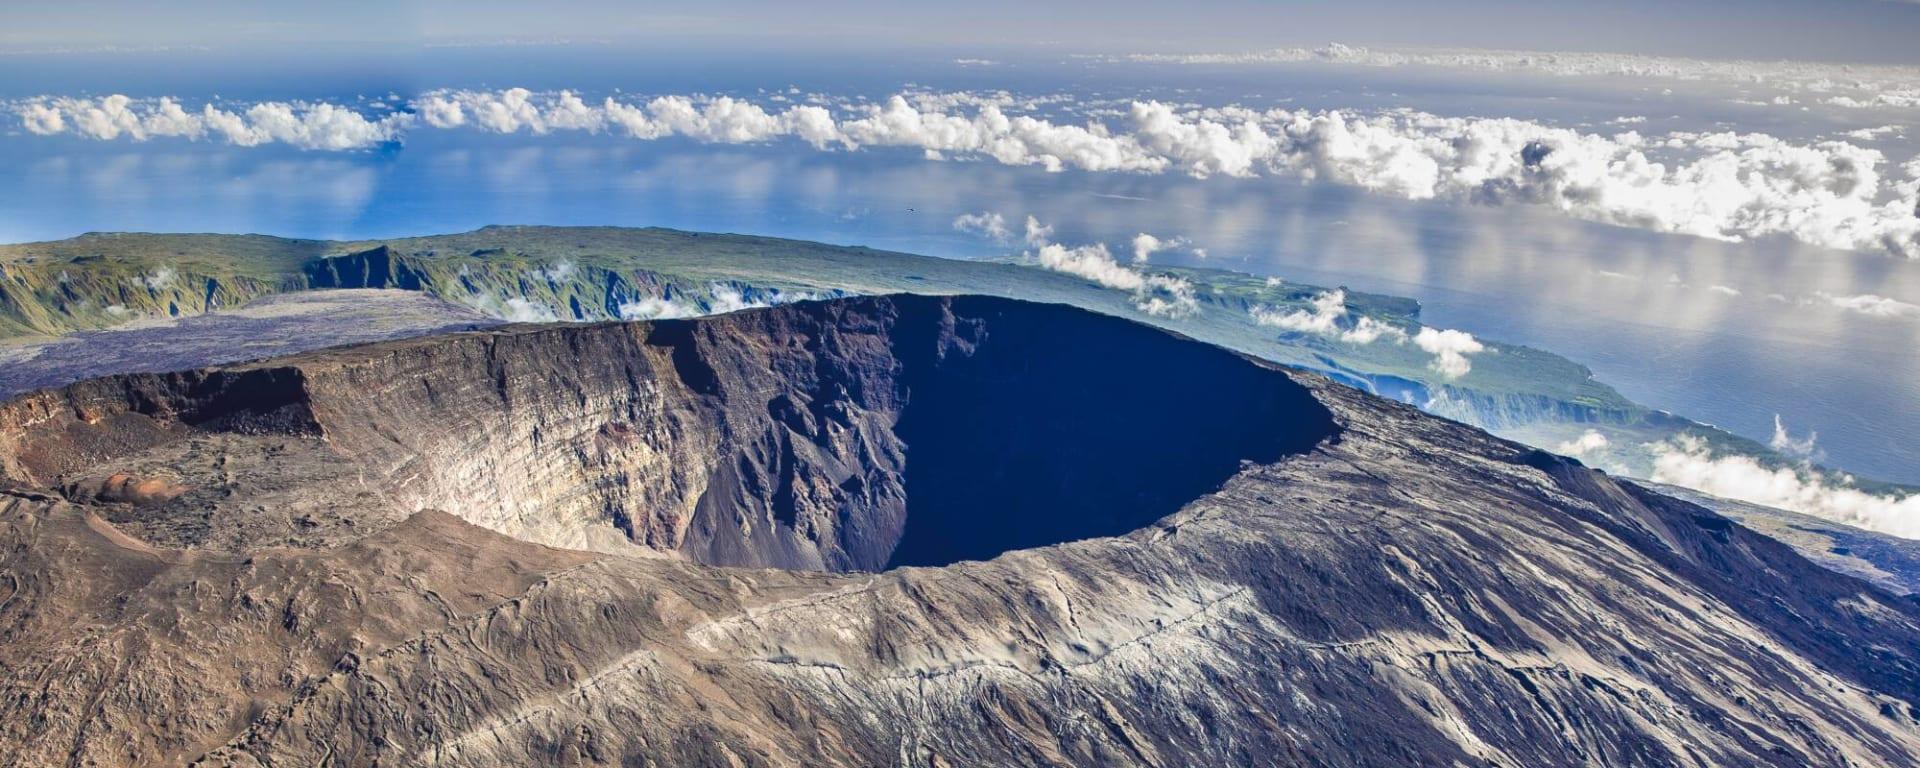 Réunion entdecken mit Tischler Reisen: Reunion Piton de la Fournaise Krater